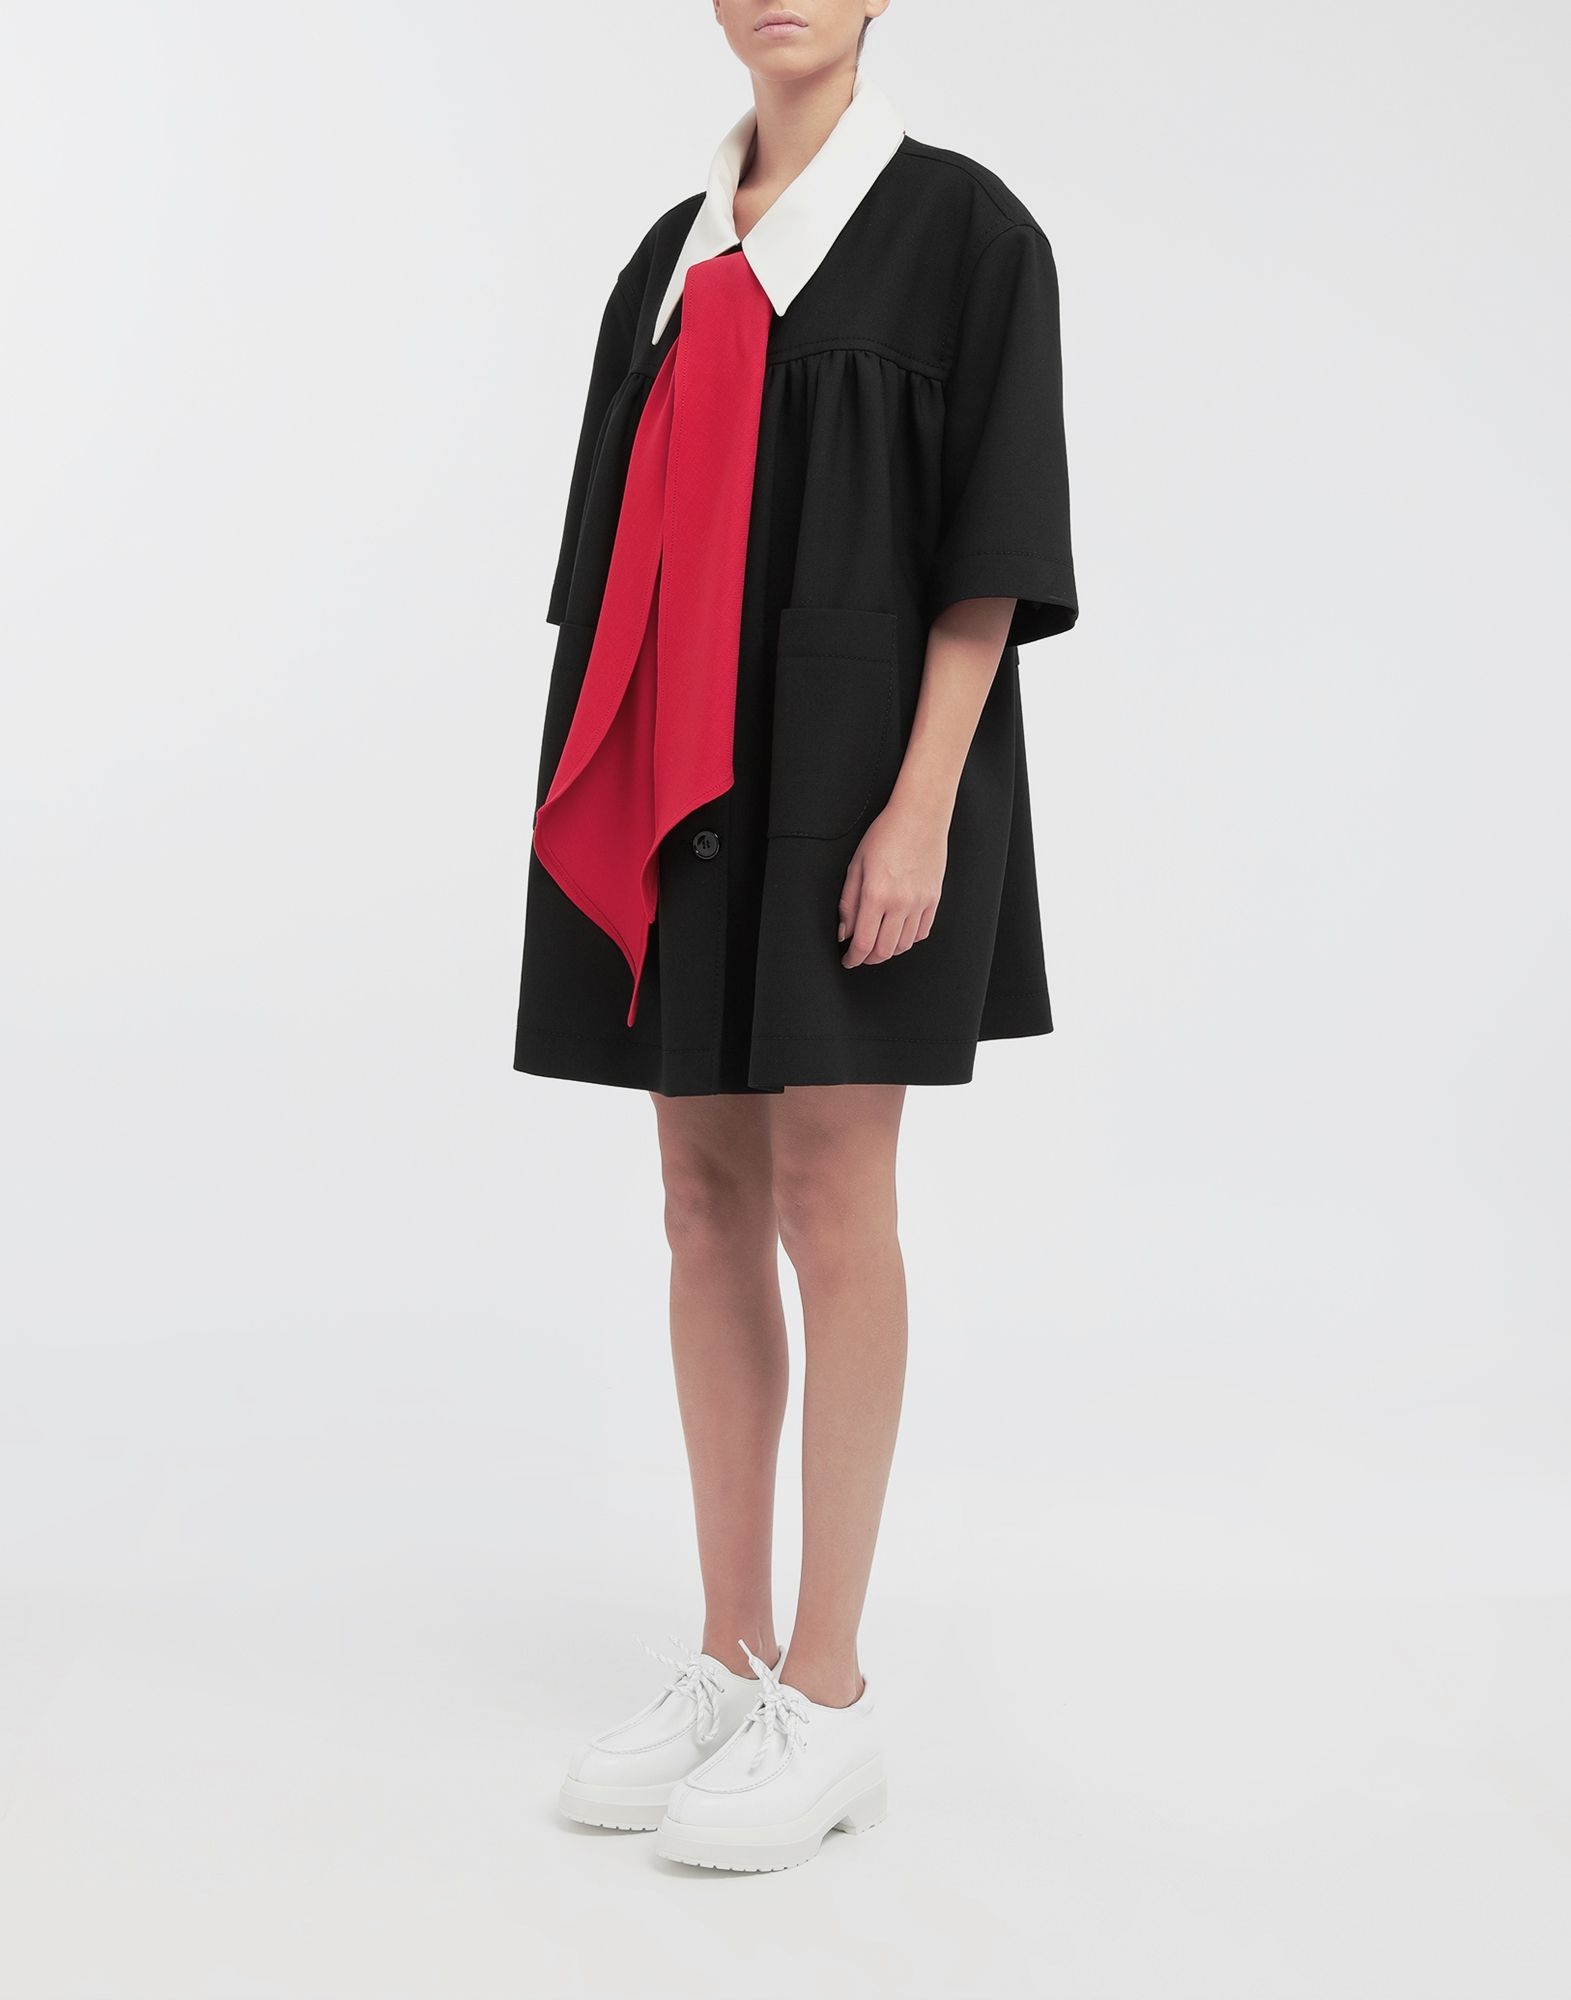 MM6 MAISON MARGIELA Oversized necktie sports jacket Full-length jacket Woman r